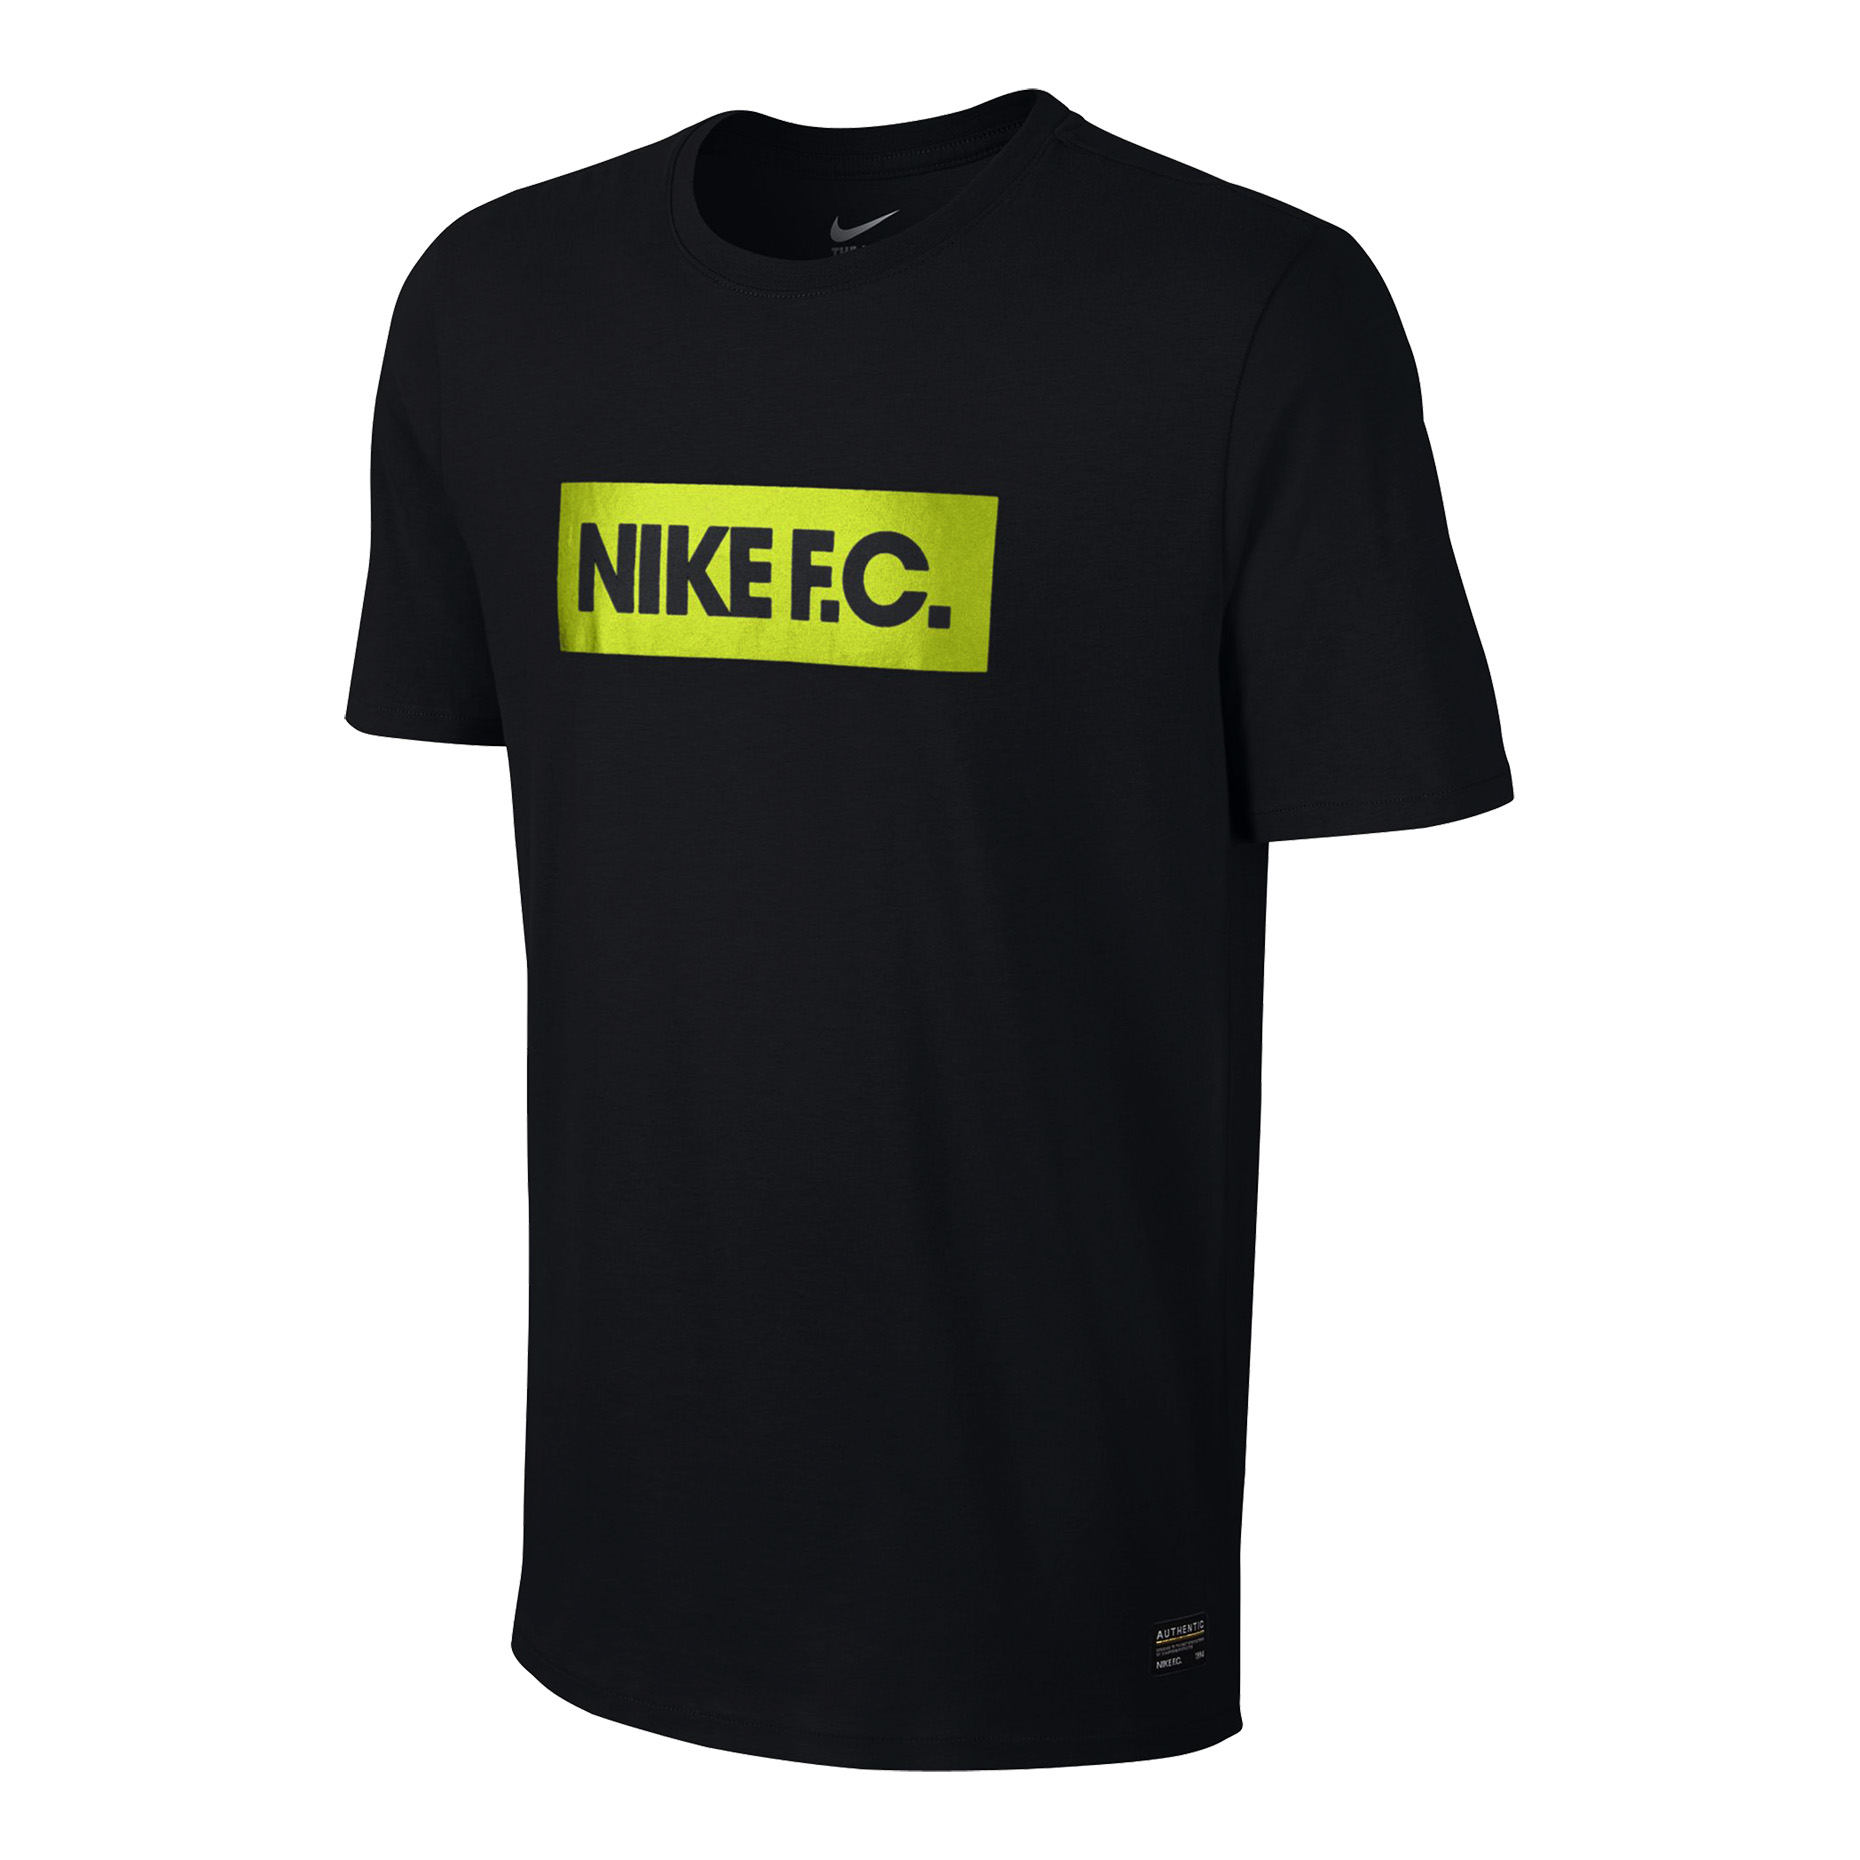 Спортивная футболка Nike  2015 FC GLORY TEE 726473-011 480 футболка спортивная nike tee mesh stripe 644147 051